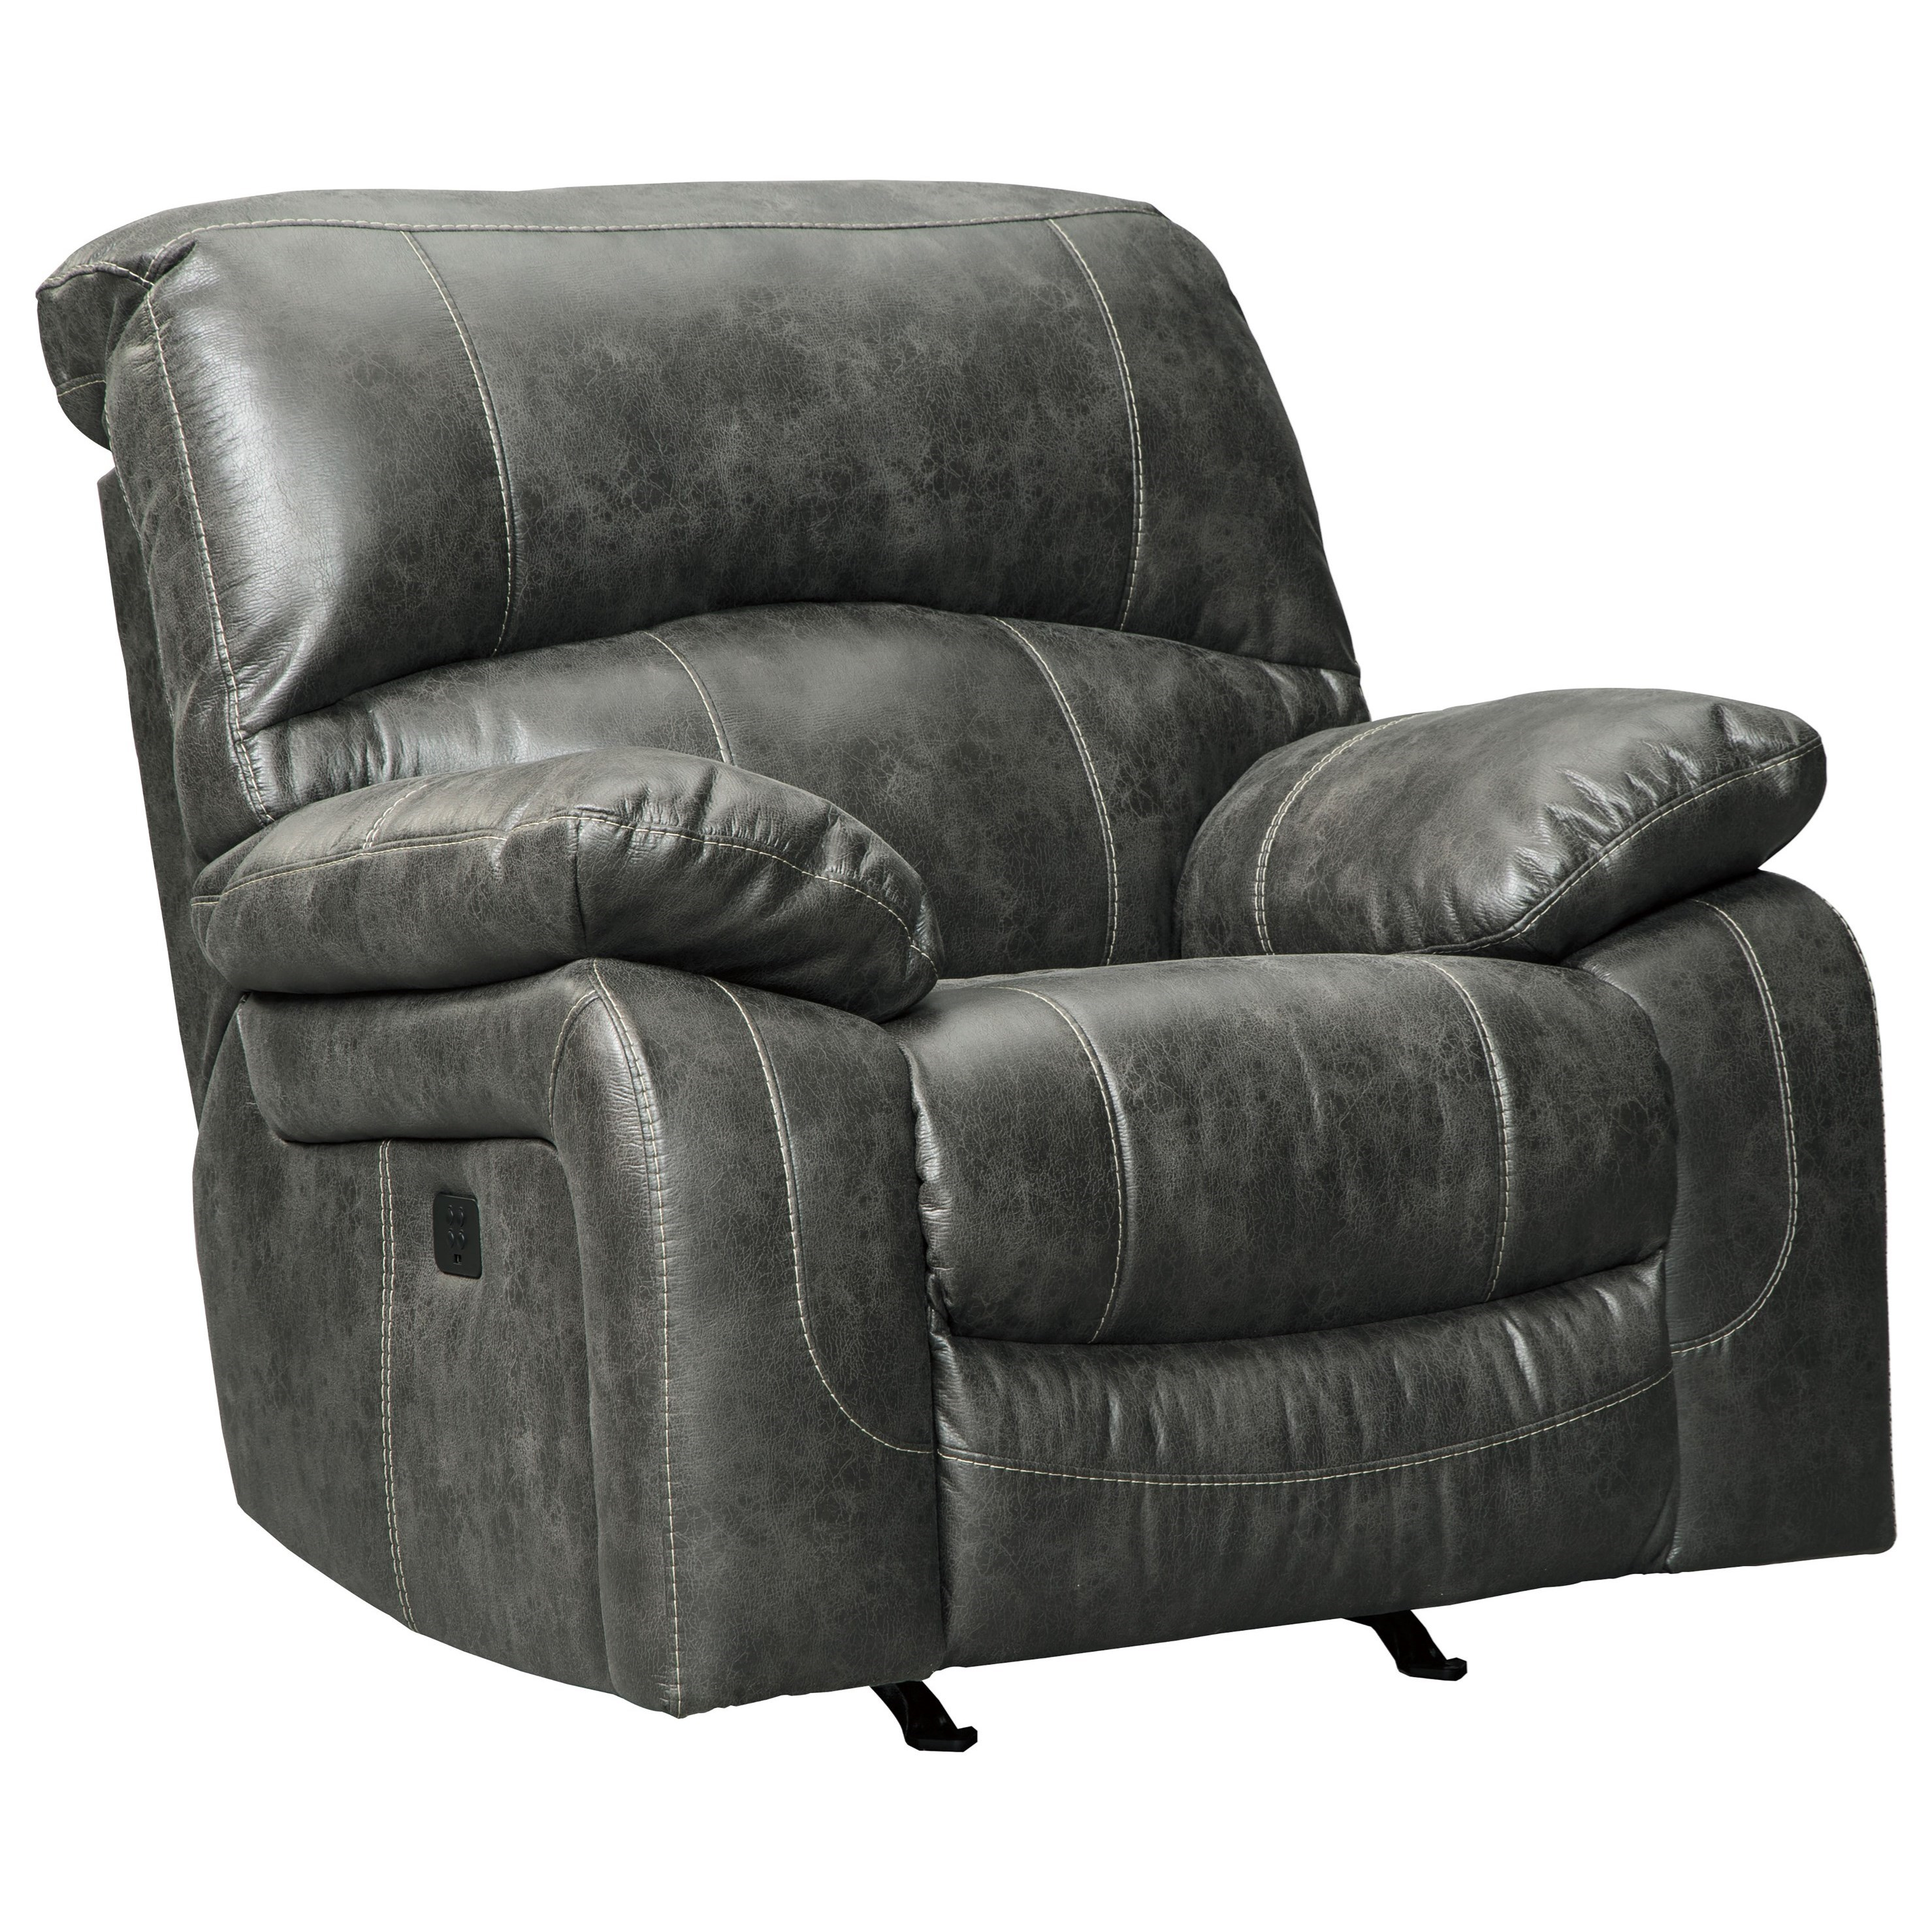 Power Rocker Recliner w/ Adjustable Headrest